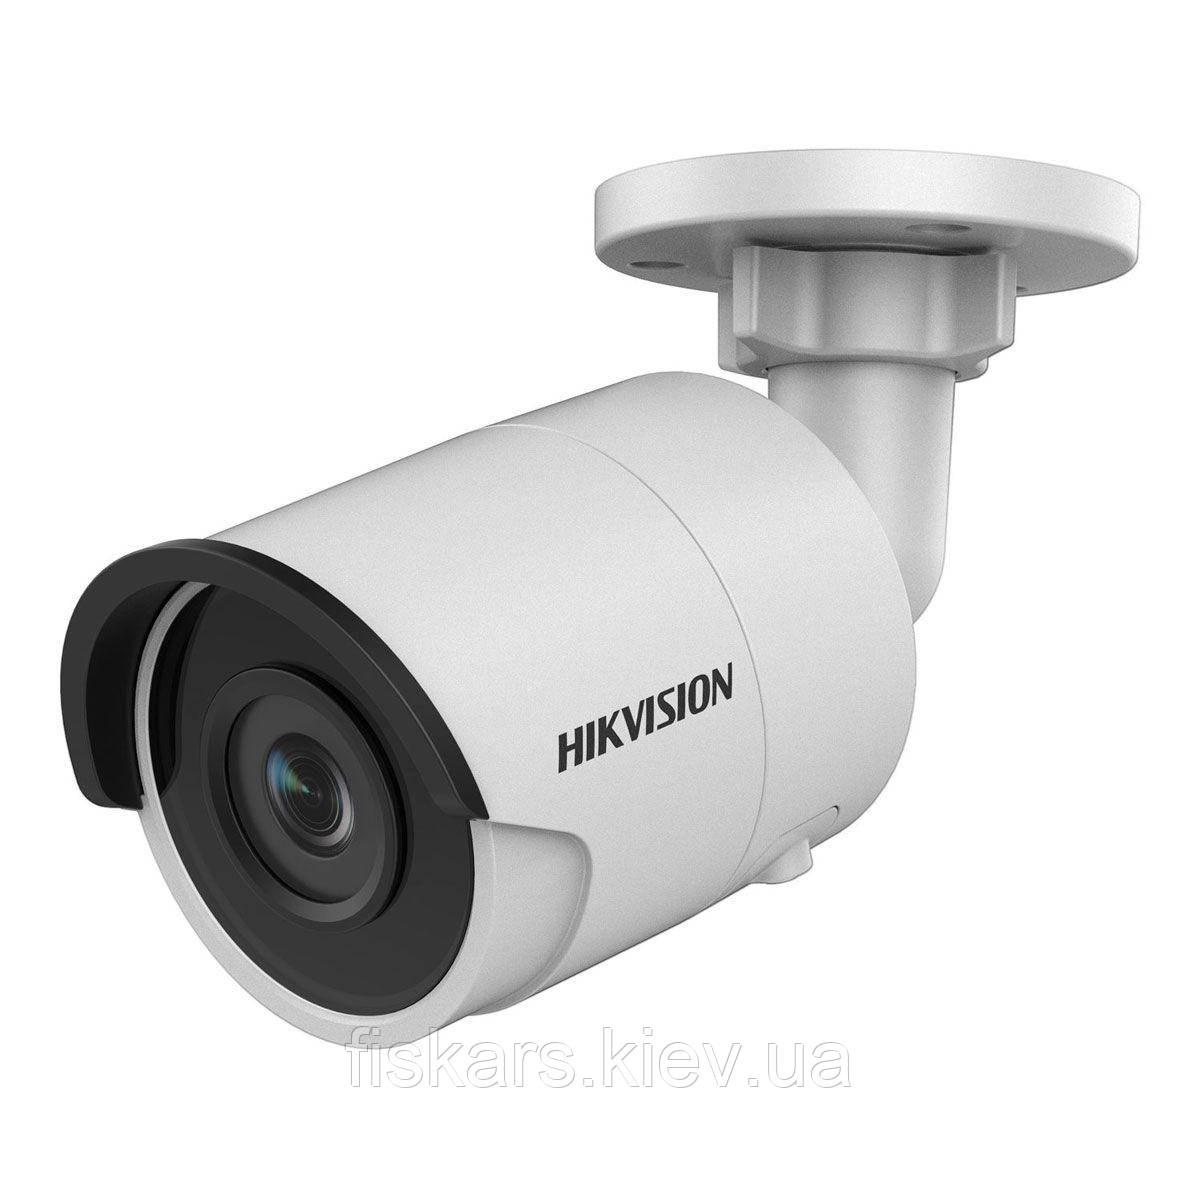 4 Мп IP-видеокамера Hikvision DS-2CD2043G0-I